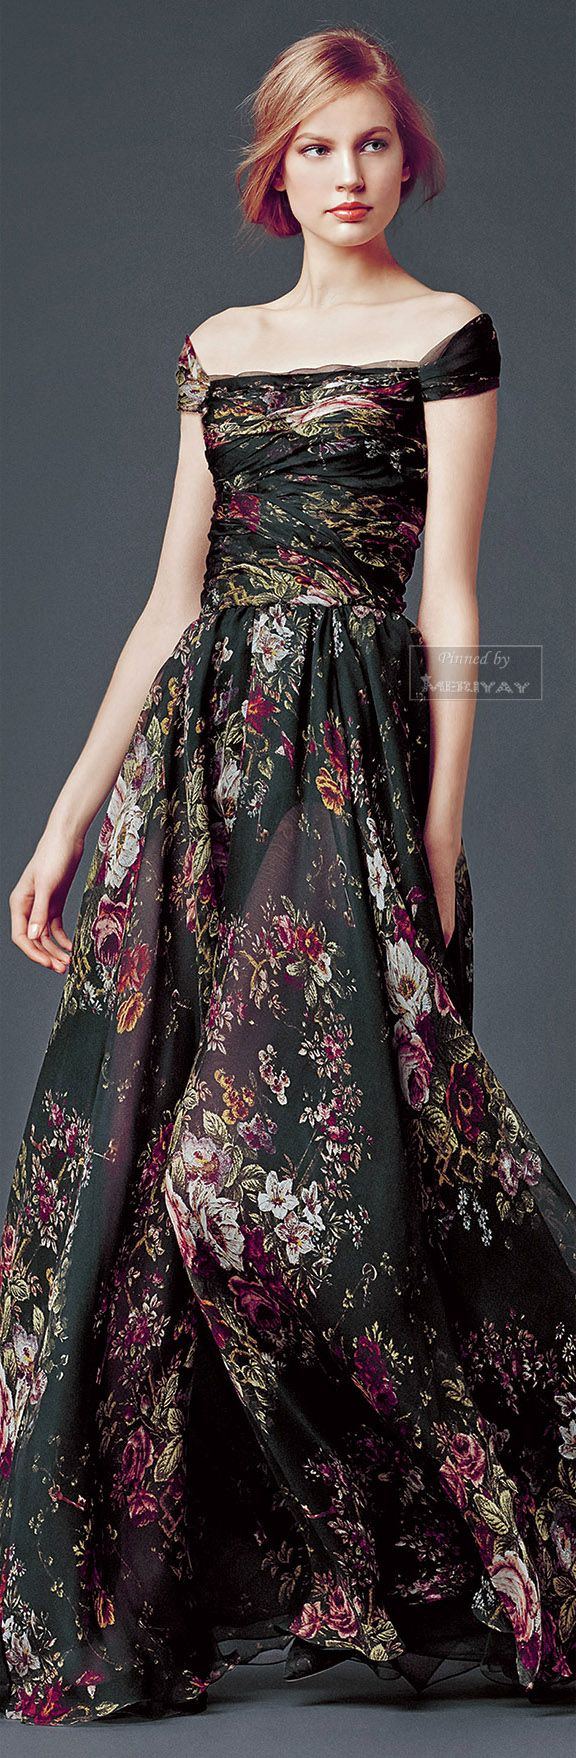 Dolce  Gabbana - Collection Fall Winter 2014 2015.    jaglady